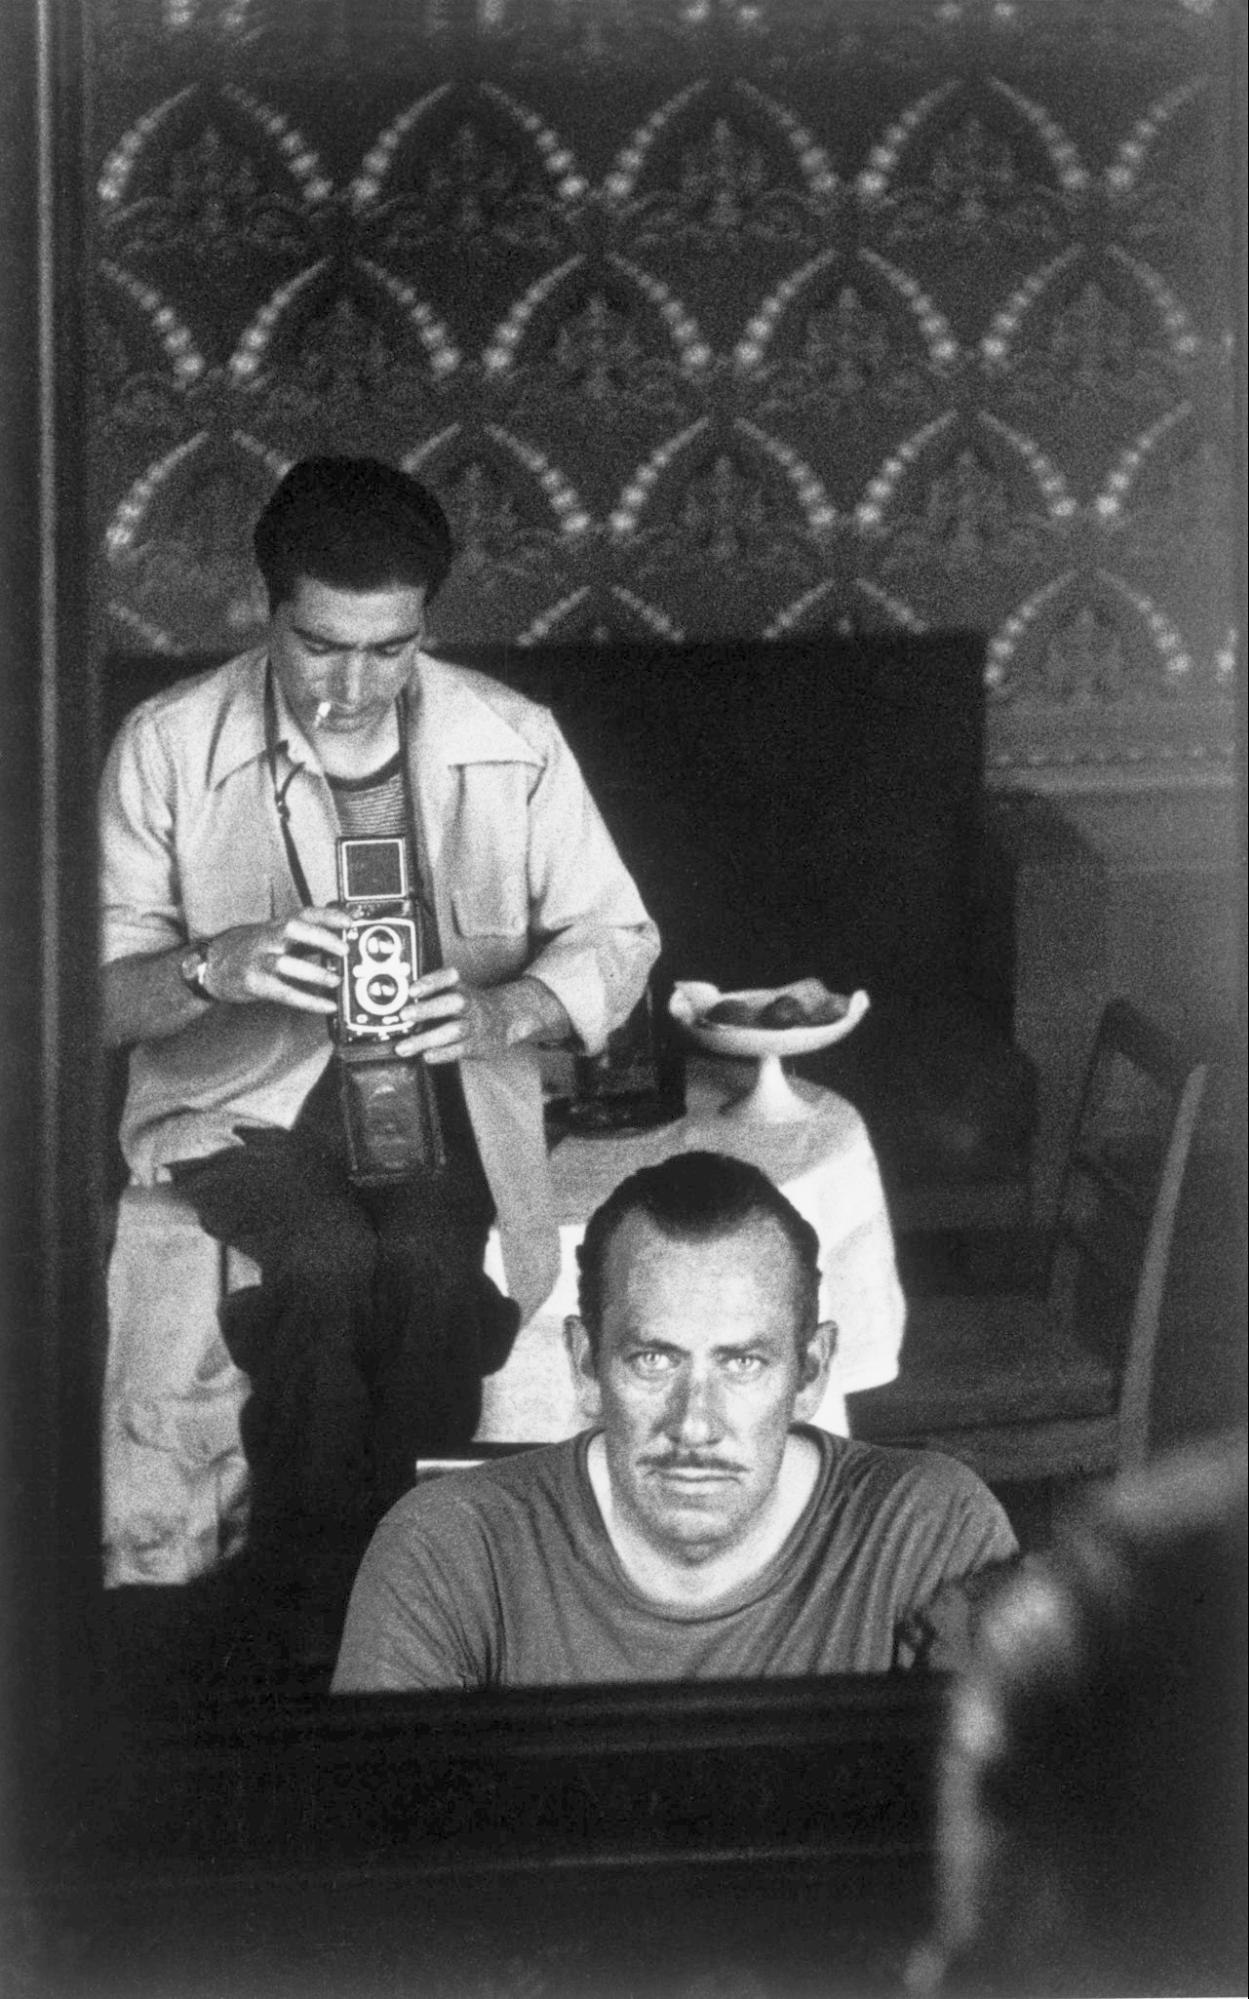 Autoritratto con John Steinbeck, 1947 © Robert Capa